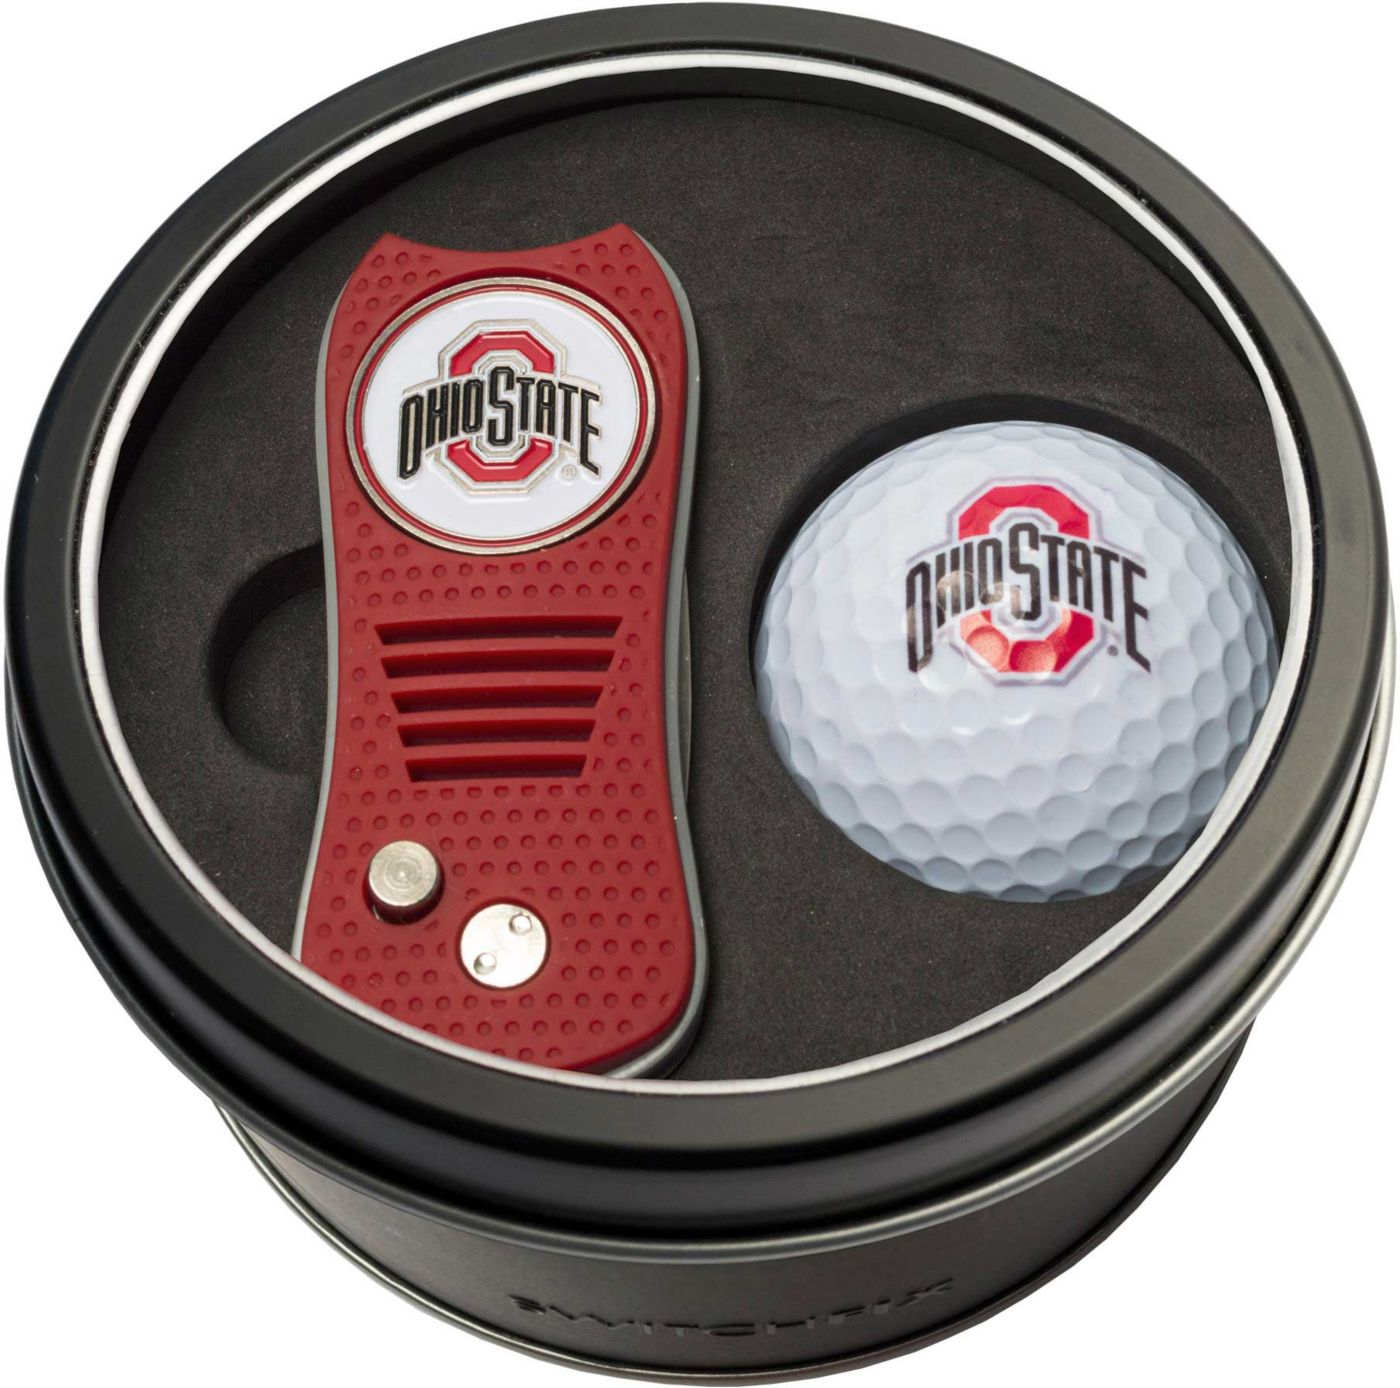 Team Golf Ohio State Buckeyes Switchfix Divot Tool and Golf Ball Set